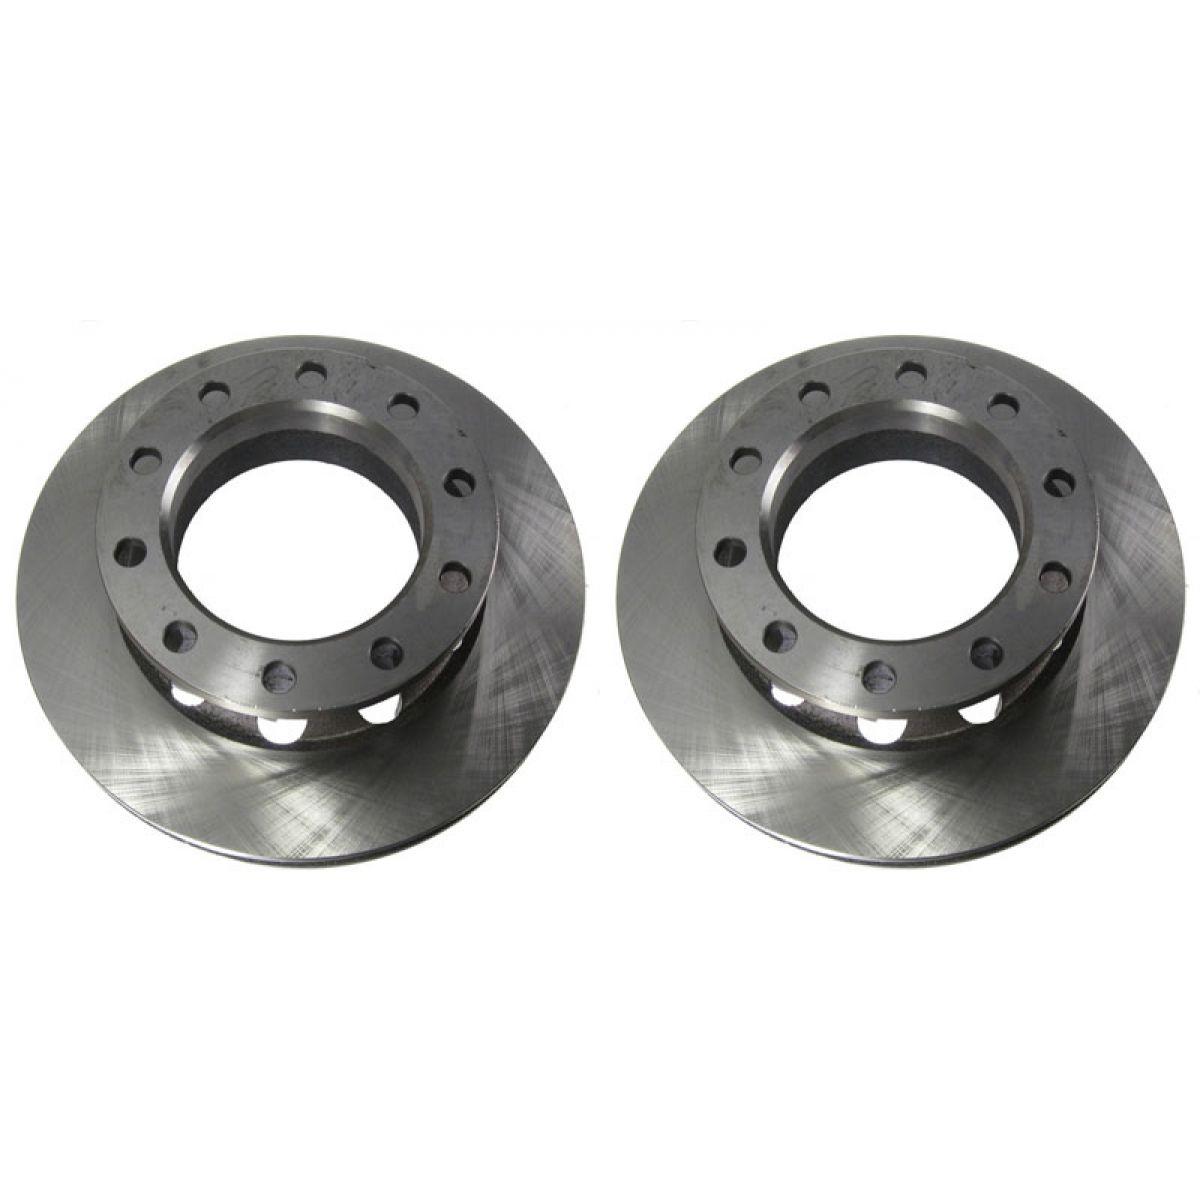 Rear disc brake rotor pair set for chevy gmc c3500 truck van 2wd 2x4 dually